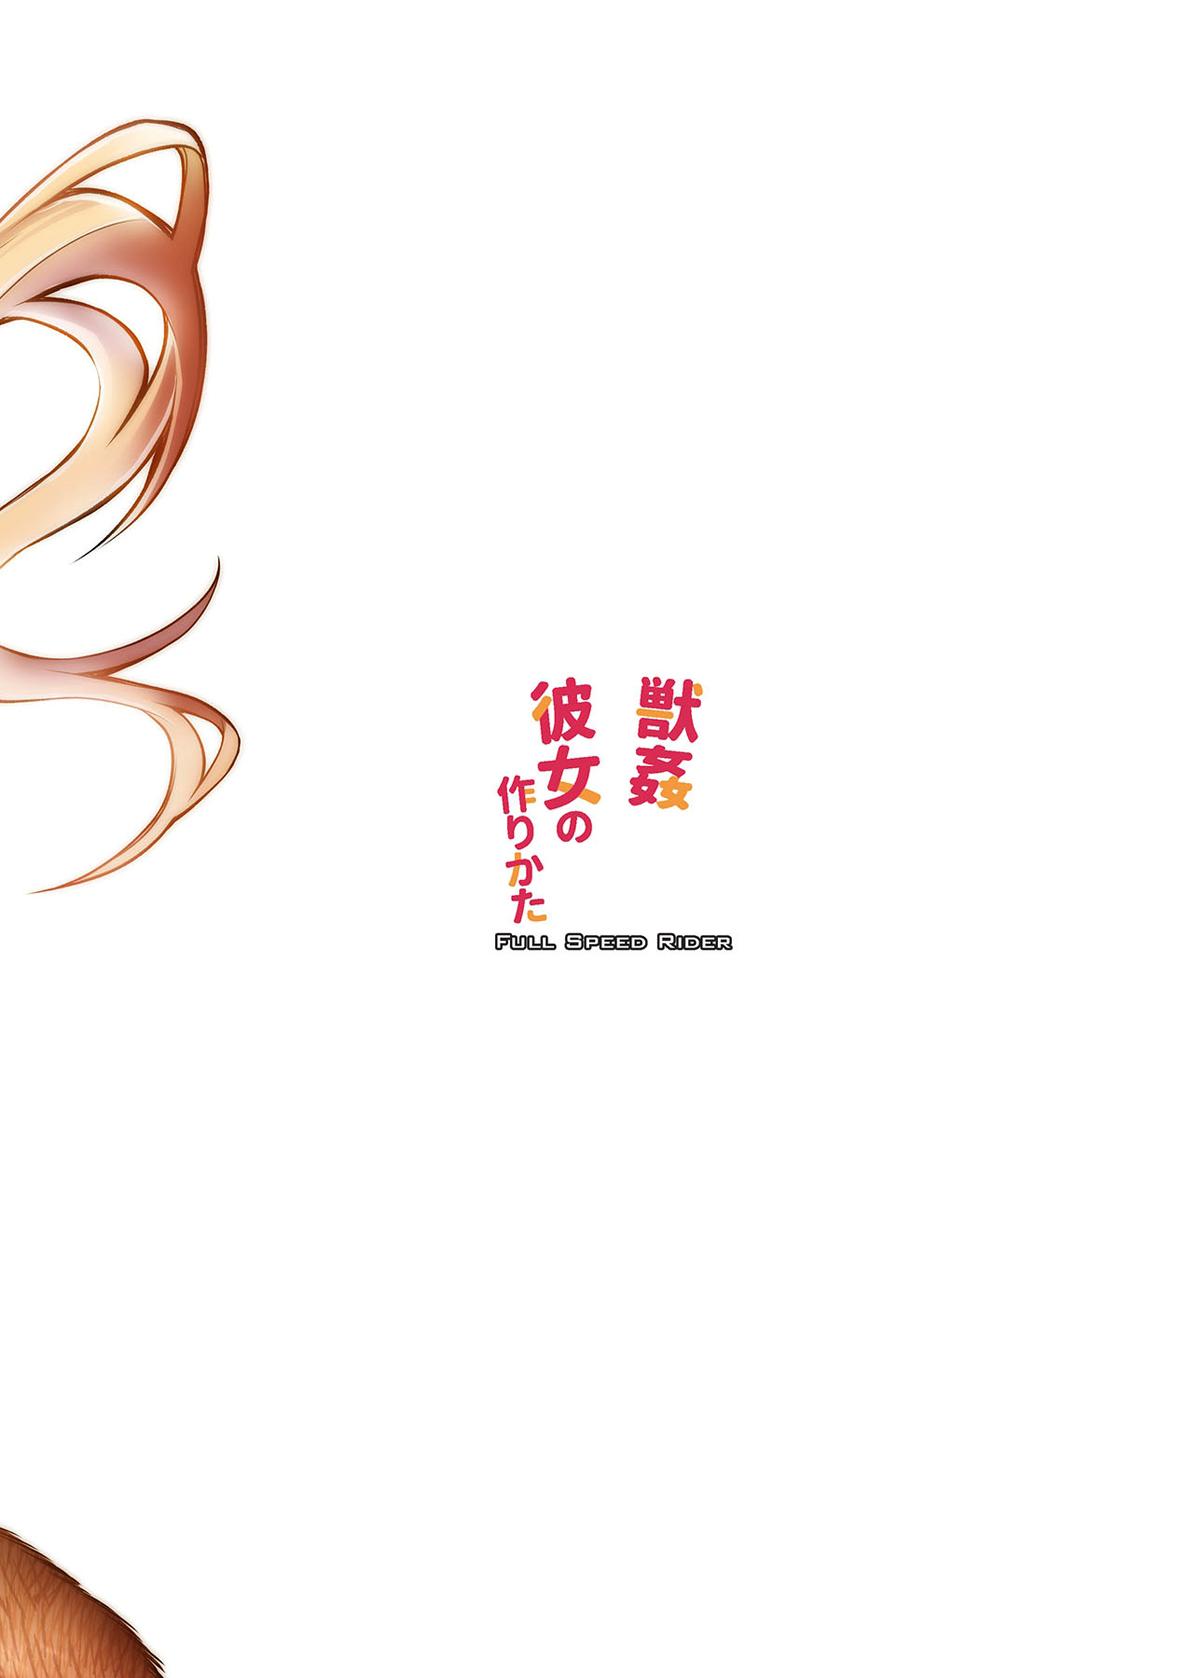 HentaiVN.net - Ảnh 26 - Juukan Kanojo no Tsukurikata - 獣姦彼女の作りかた - Oneshot